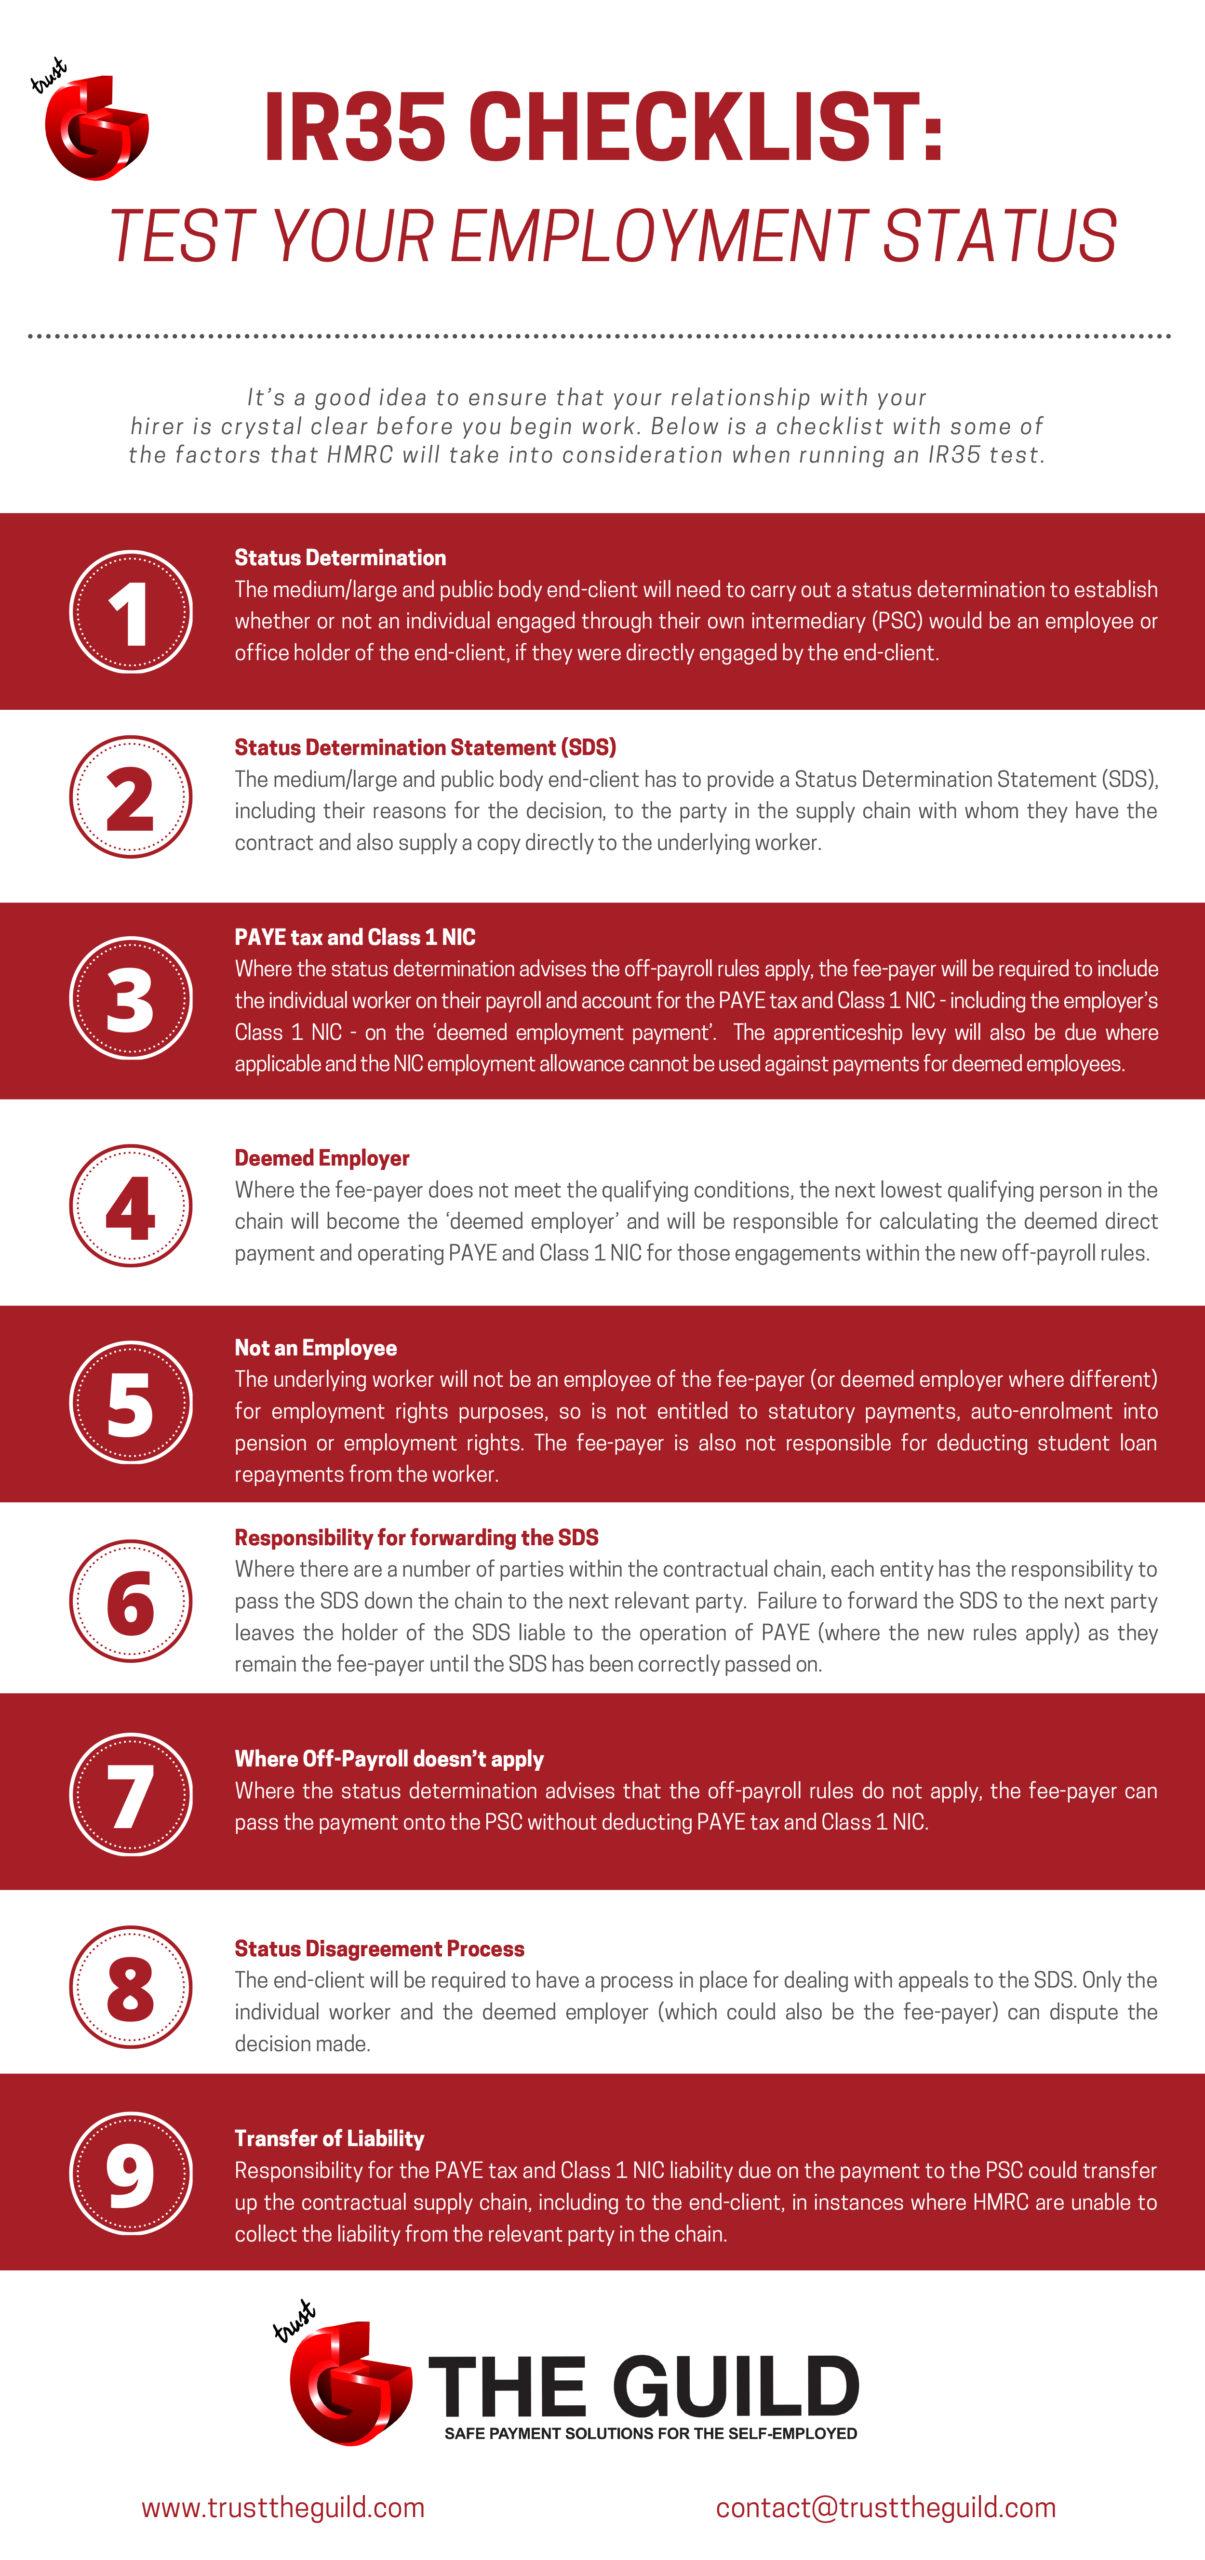 ir35 checklist infographic CH 12.01.21 draft v2